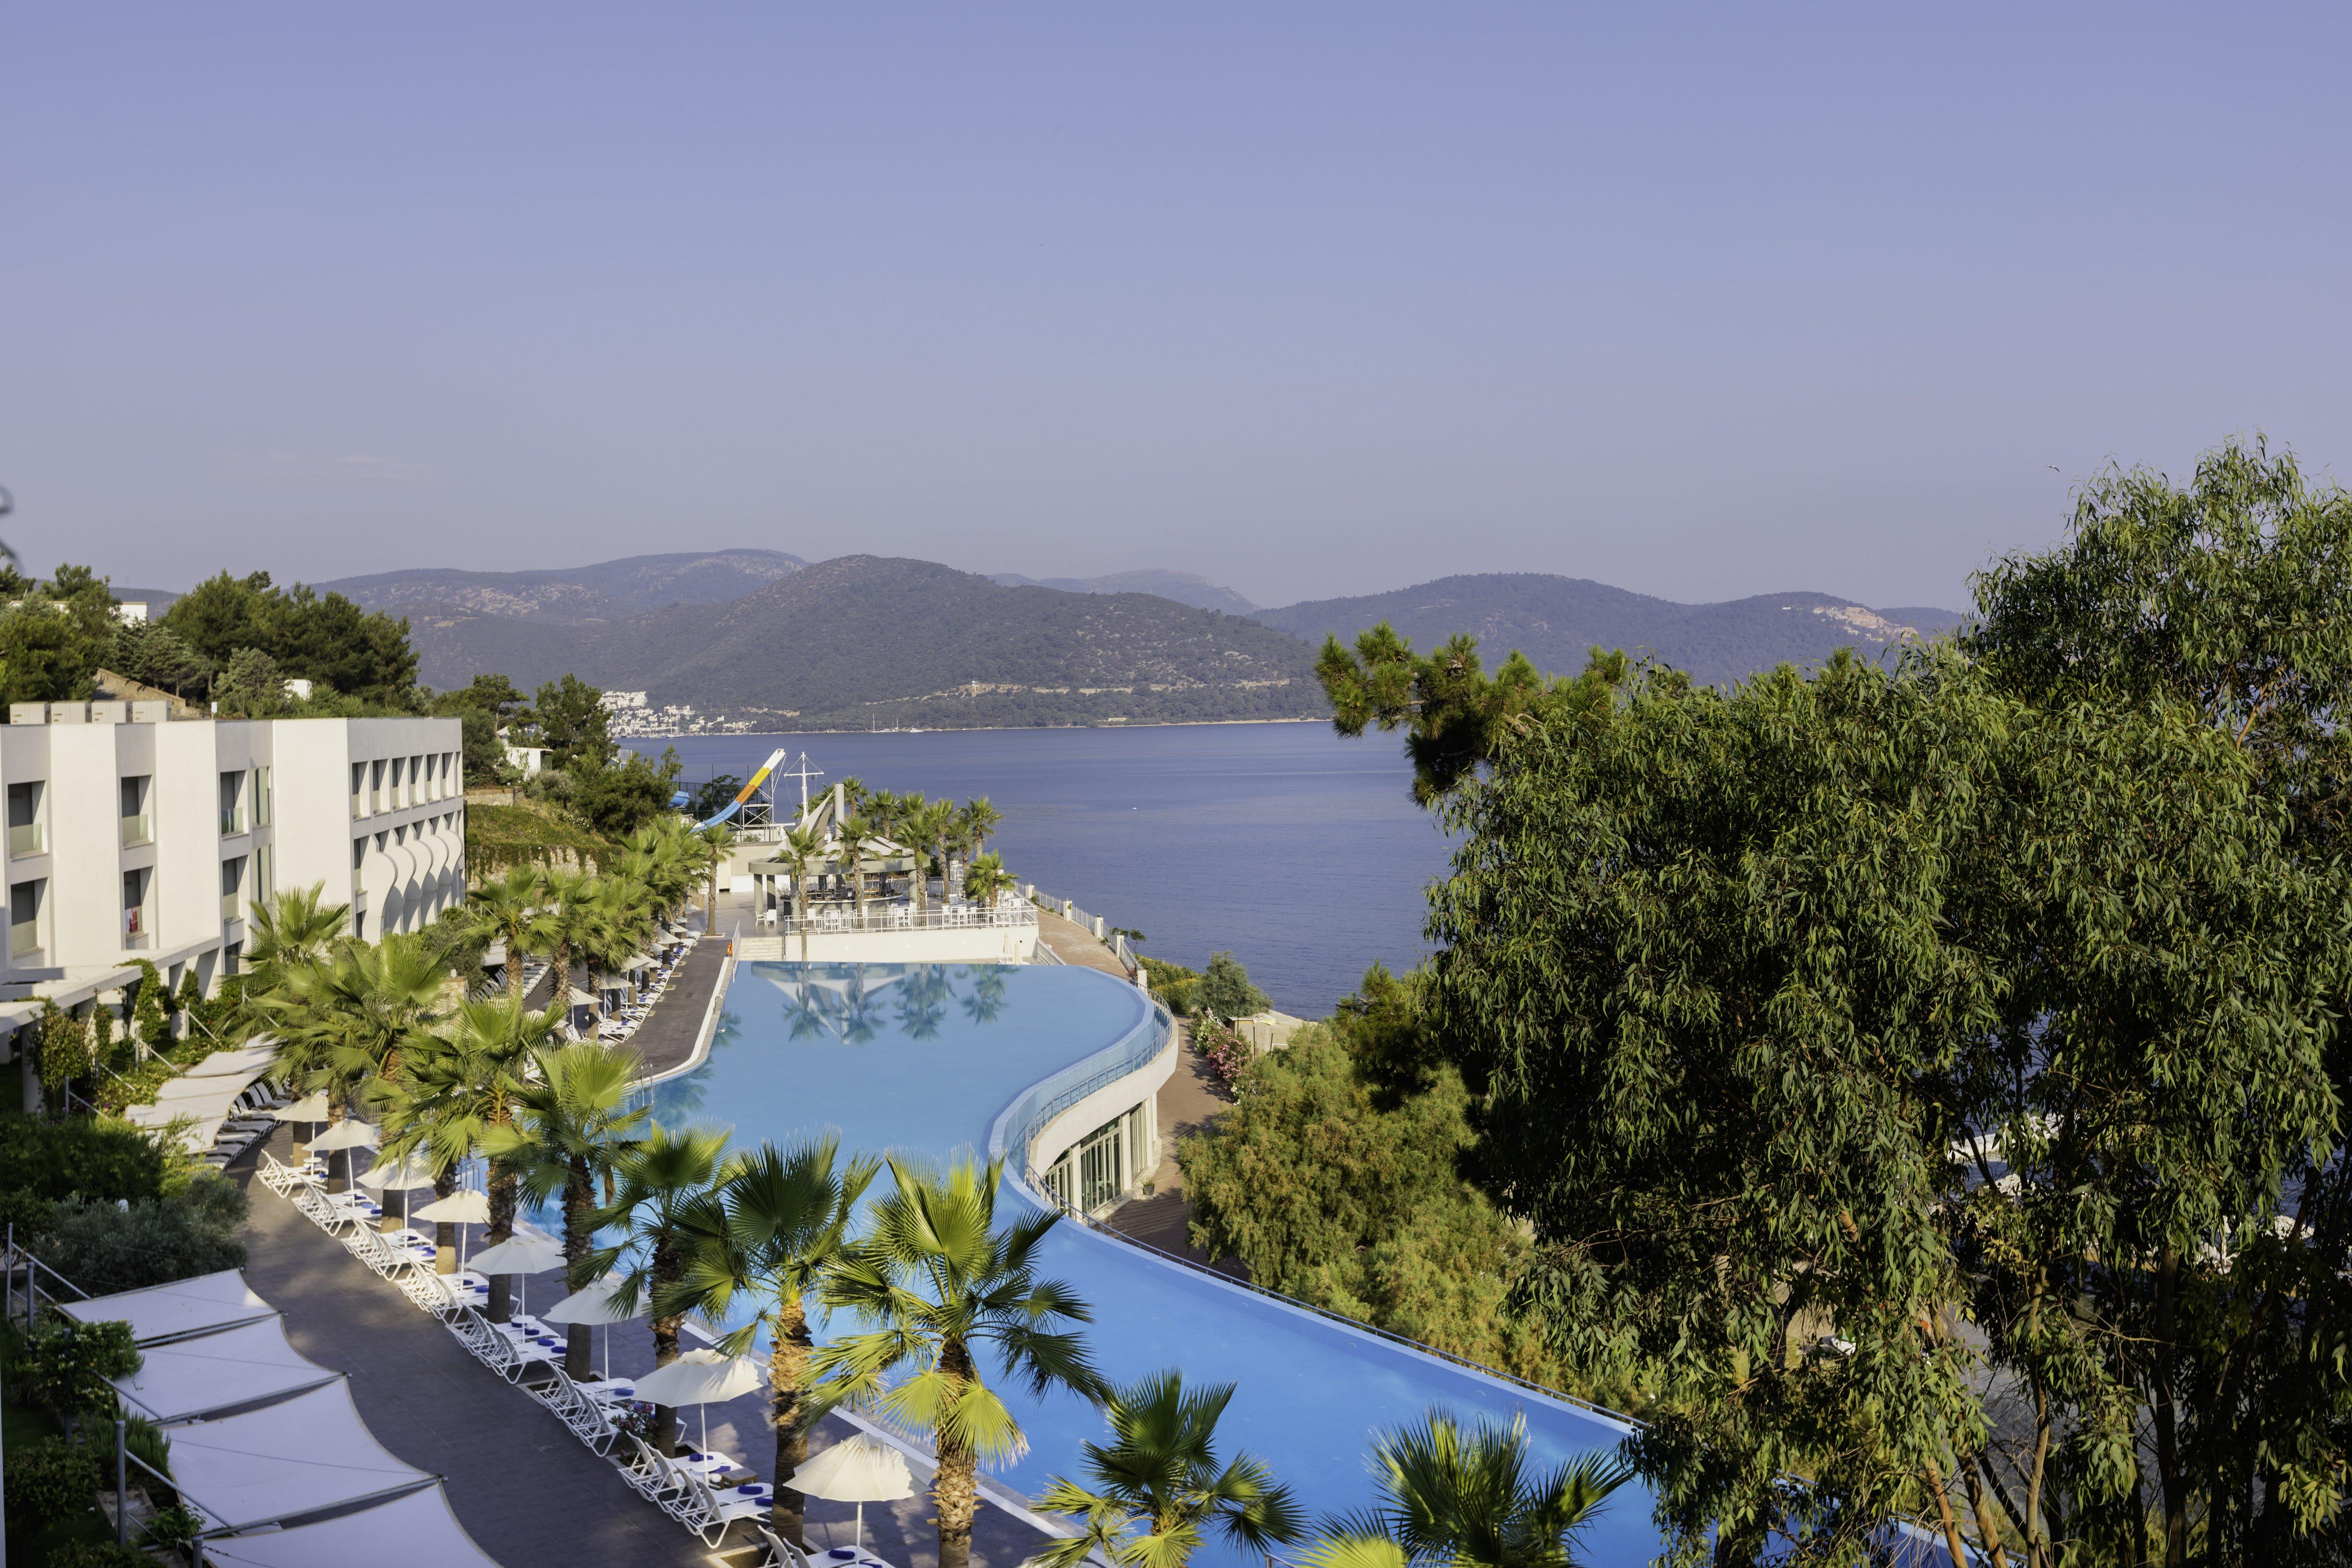 kairaba-blue-dreams-club-hotel-genel-0020